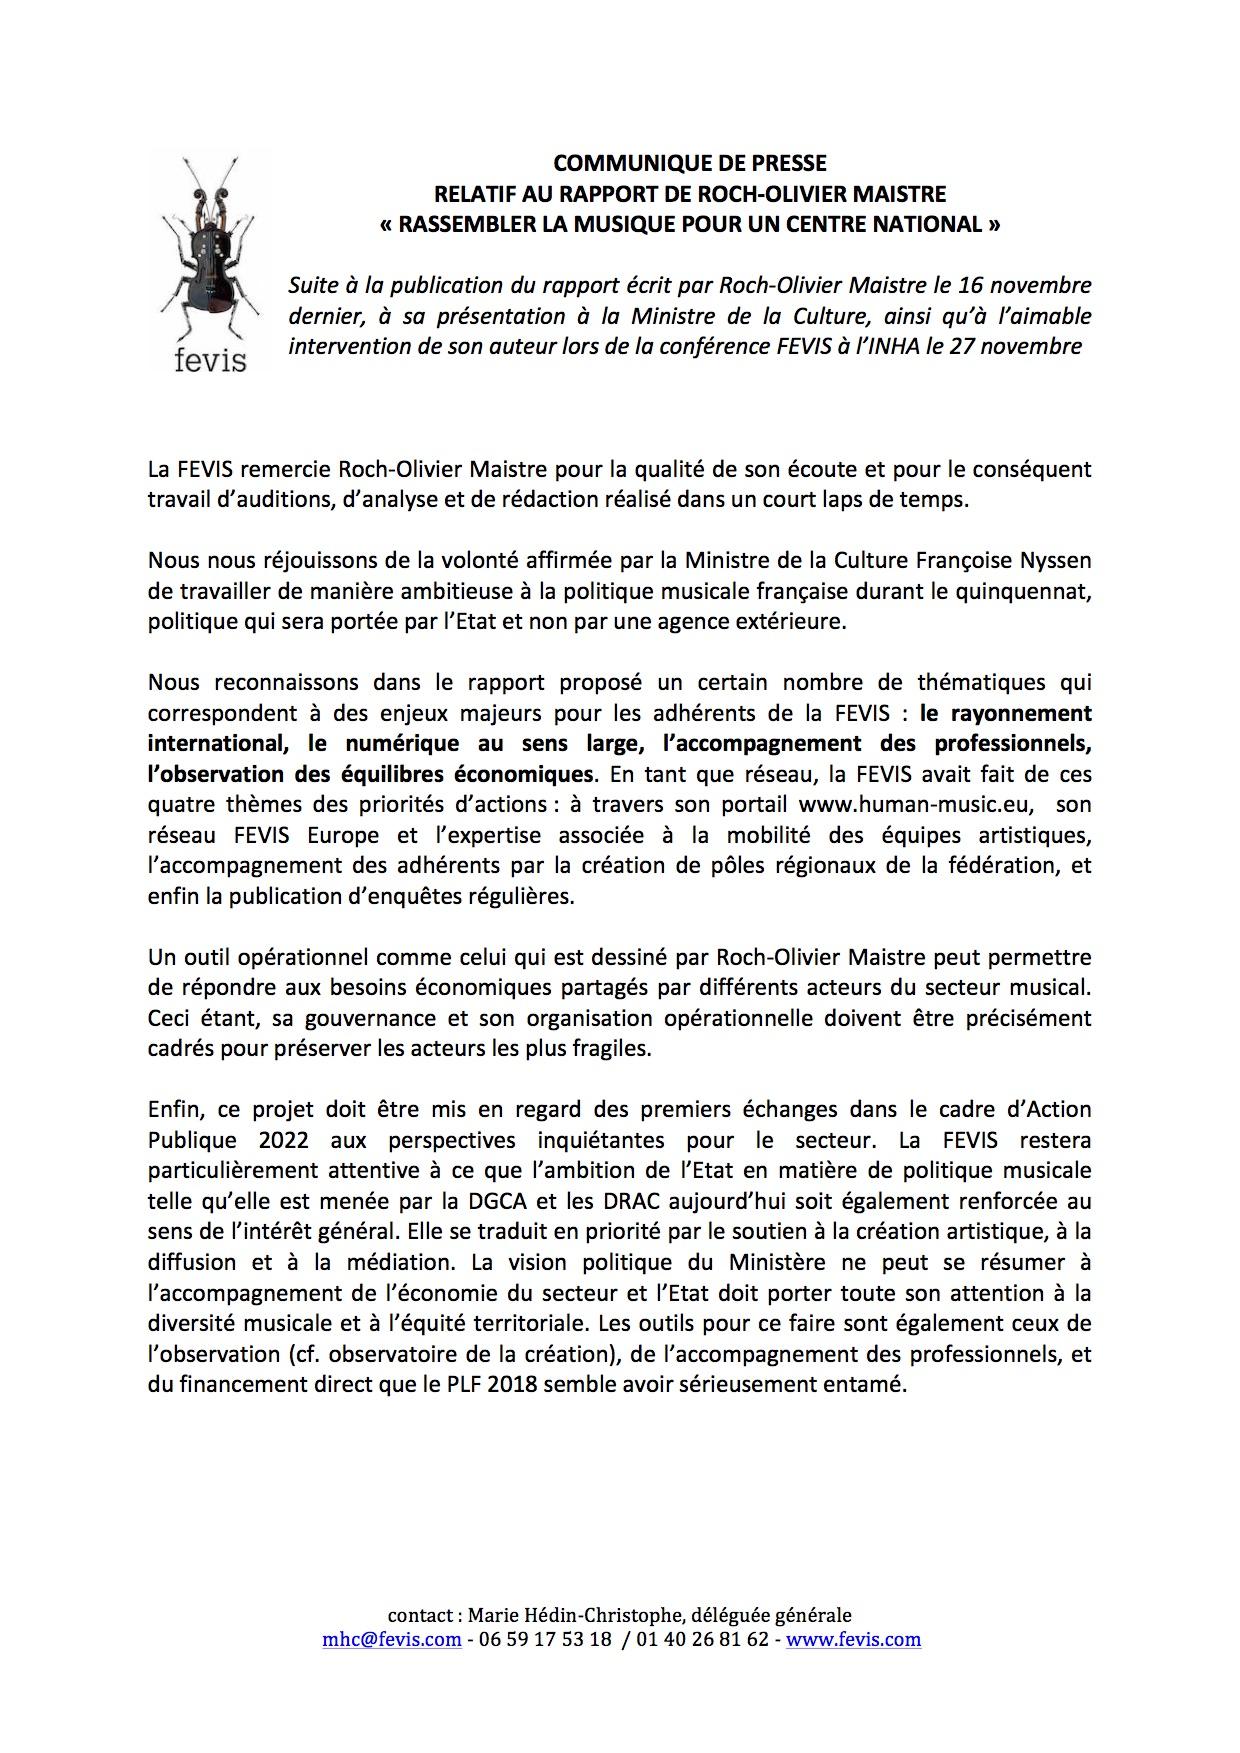 CP FEVIS rapport Roch Olivier Maistre - copie